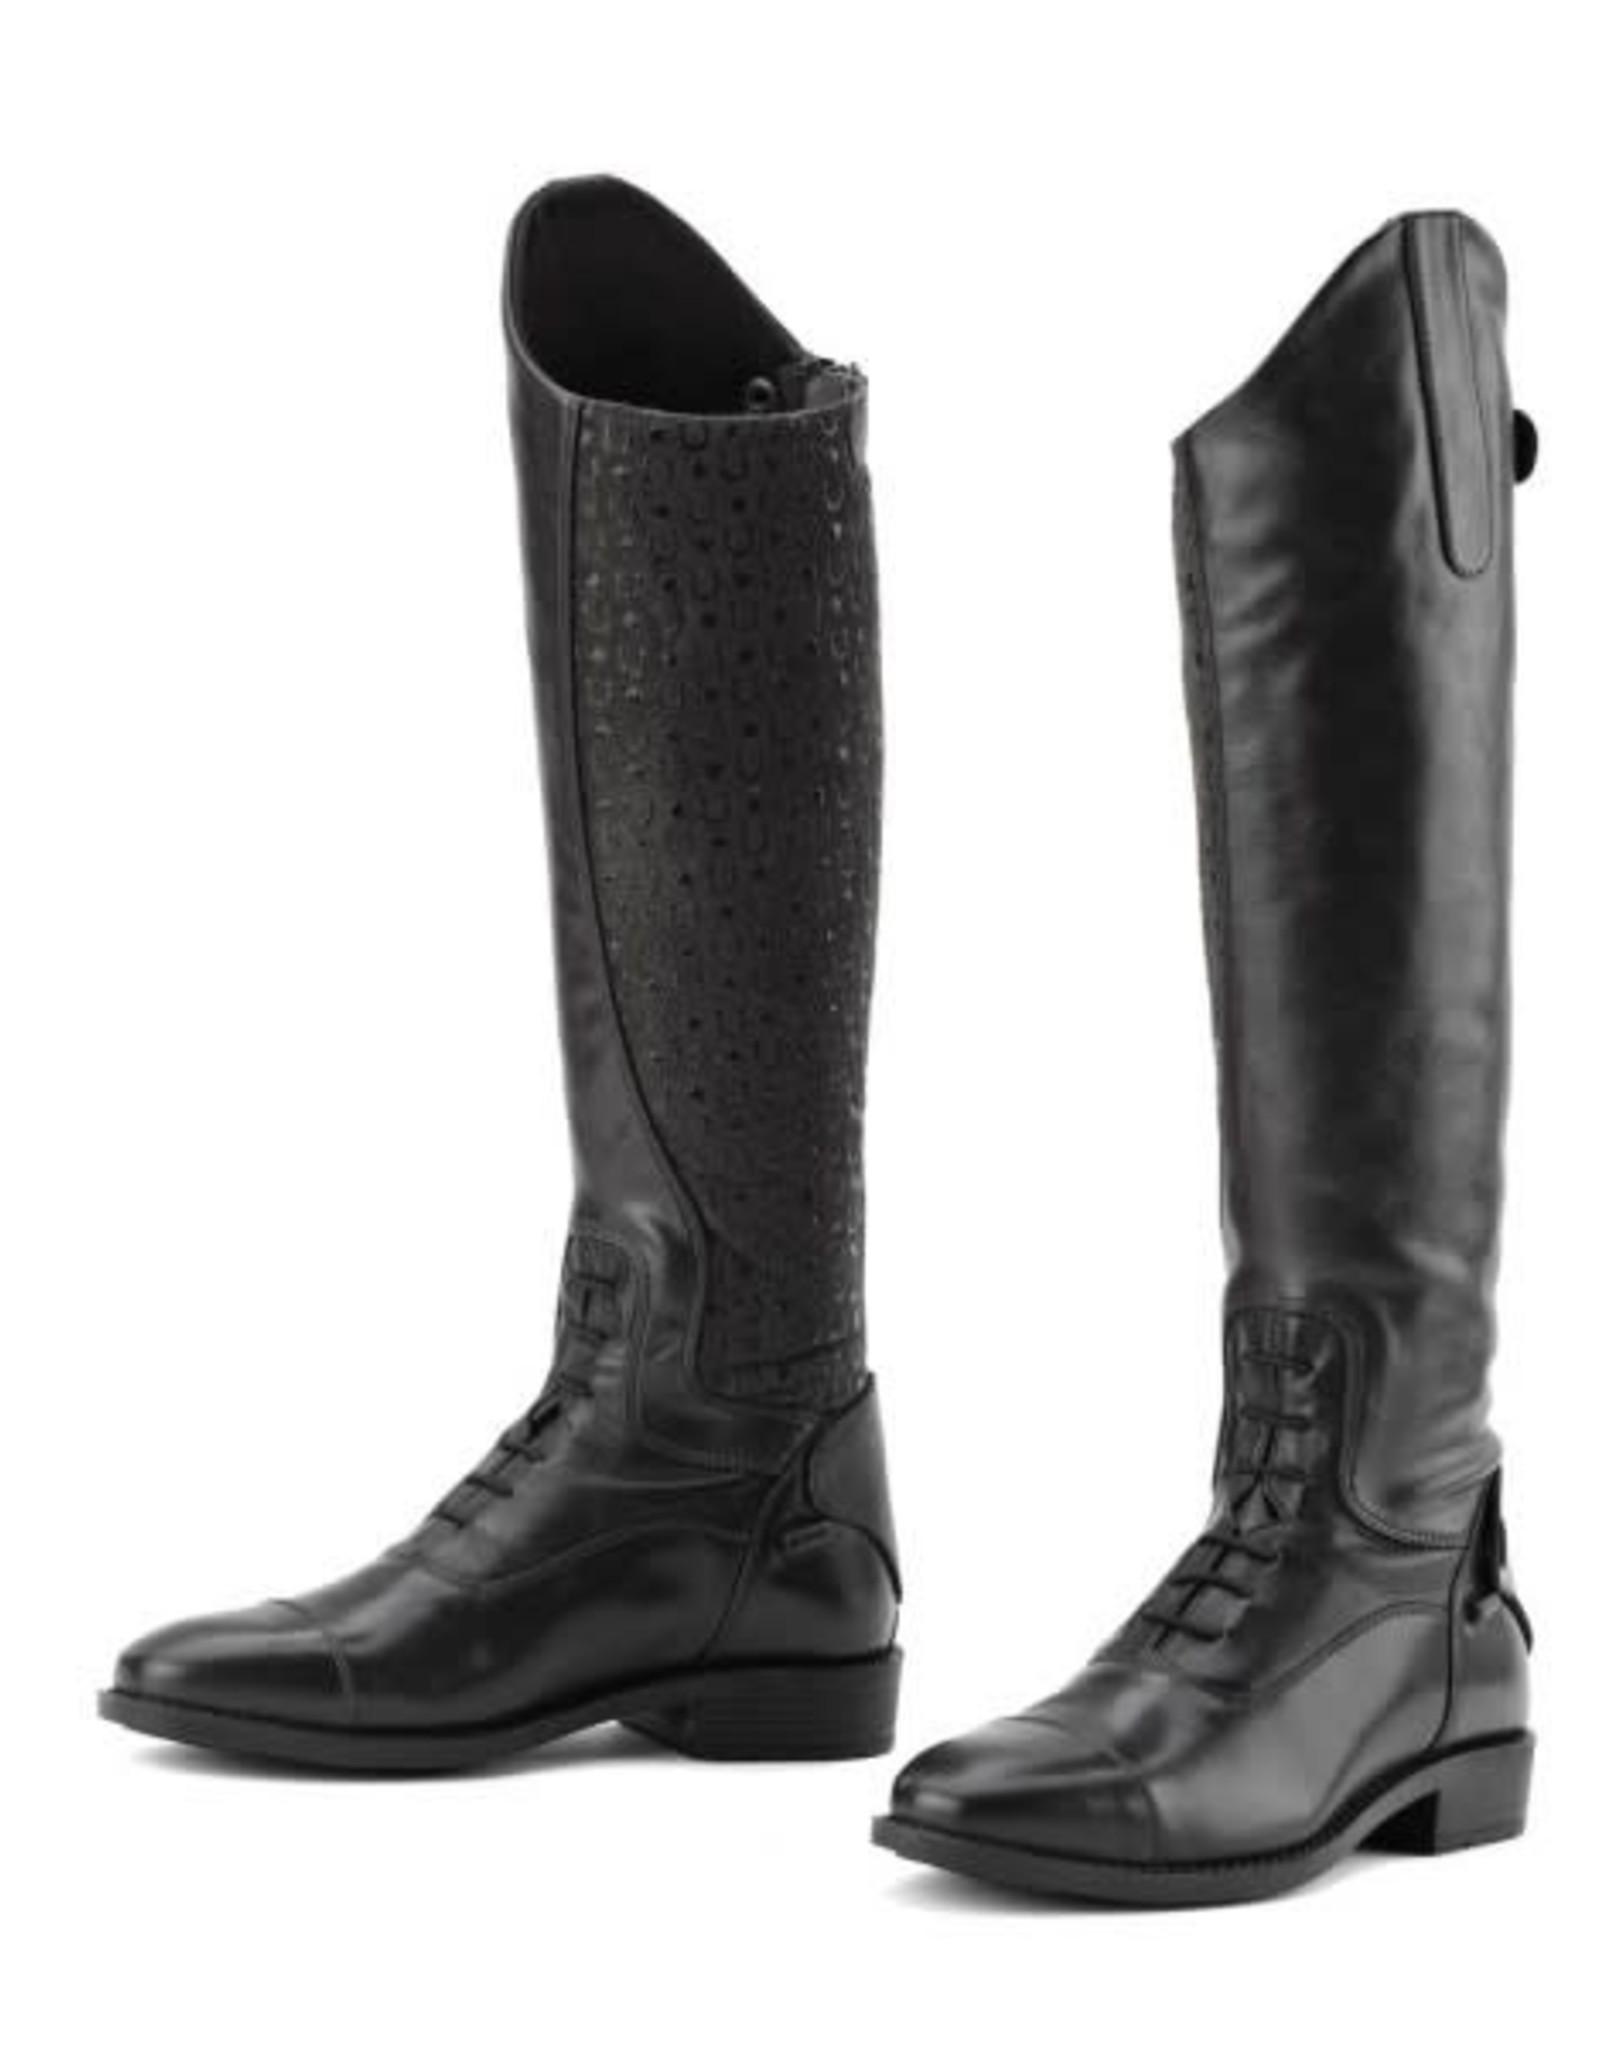 Ovation Sofia Grip Black Field Boot- Ladies'